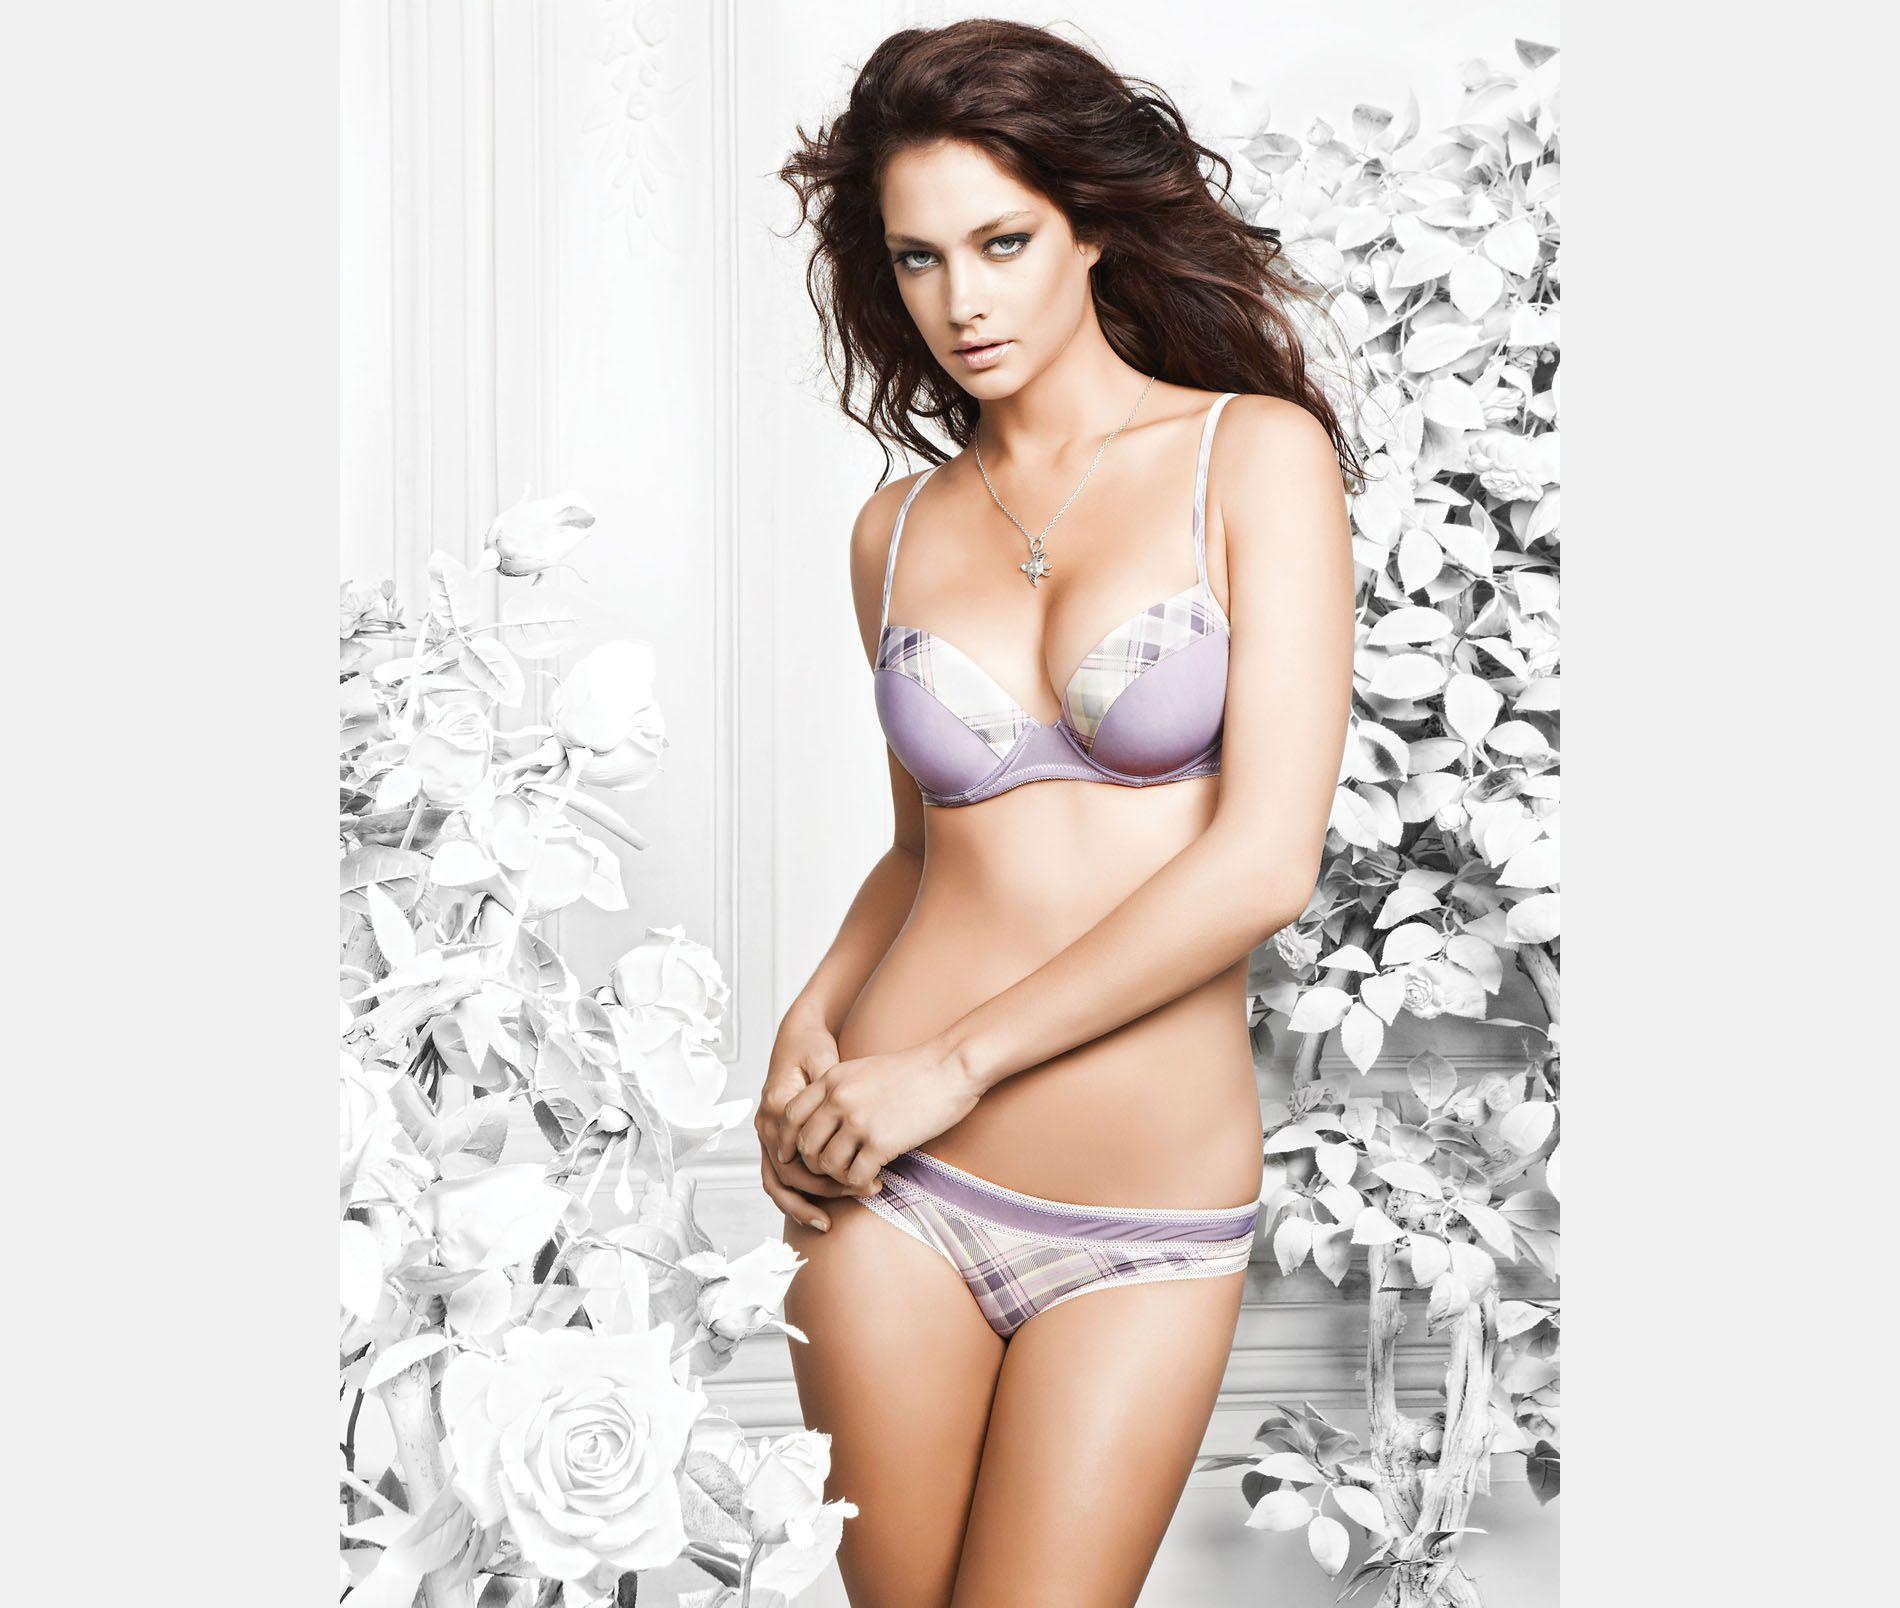 Candice_Boucher_14.jpg | Models Rating